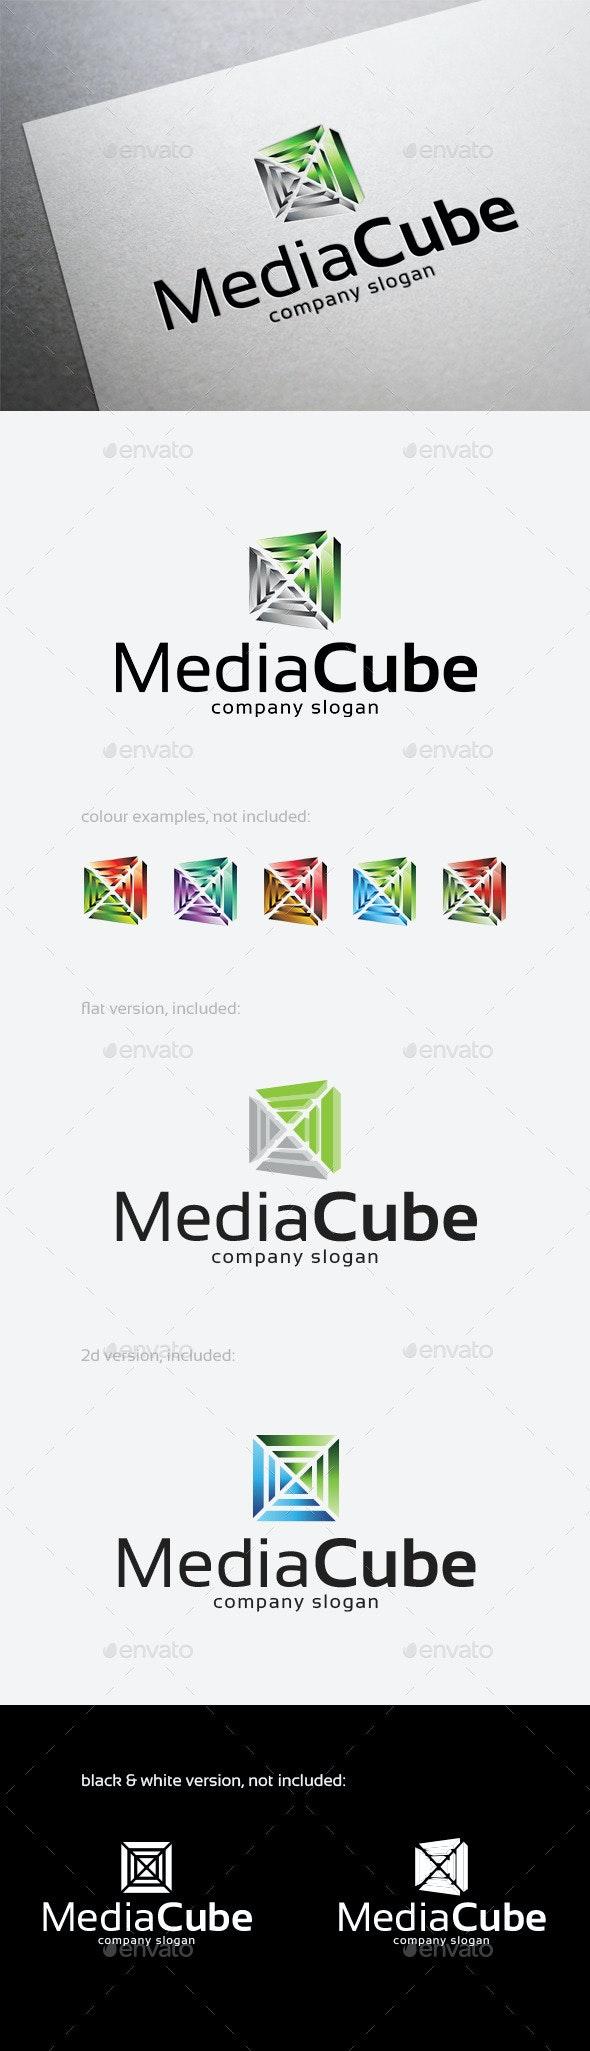 Media Cube Logo - Abstract Logo Templates